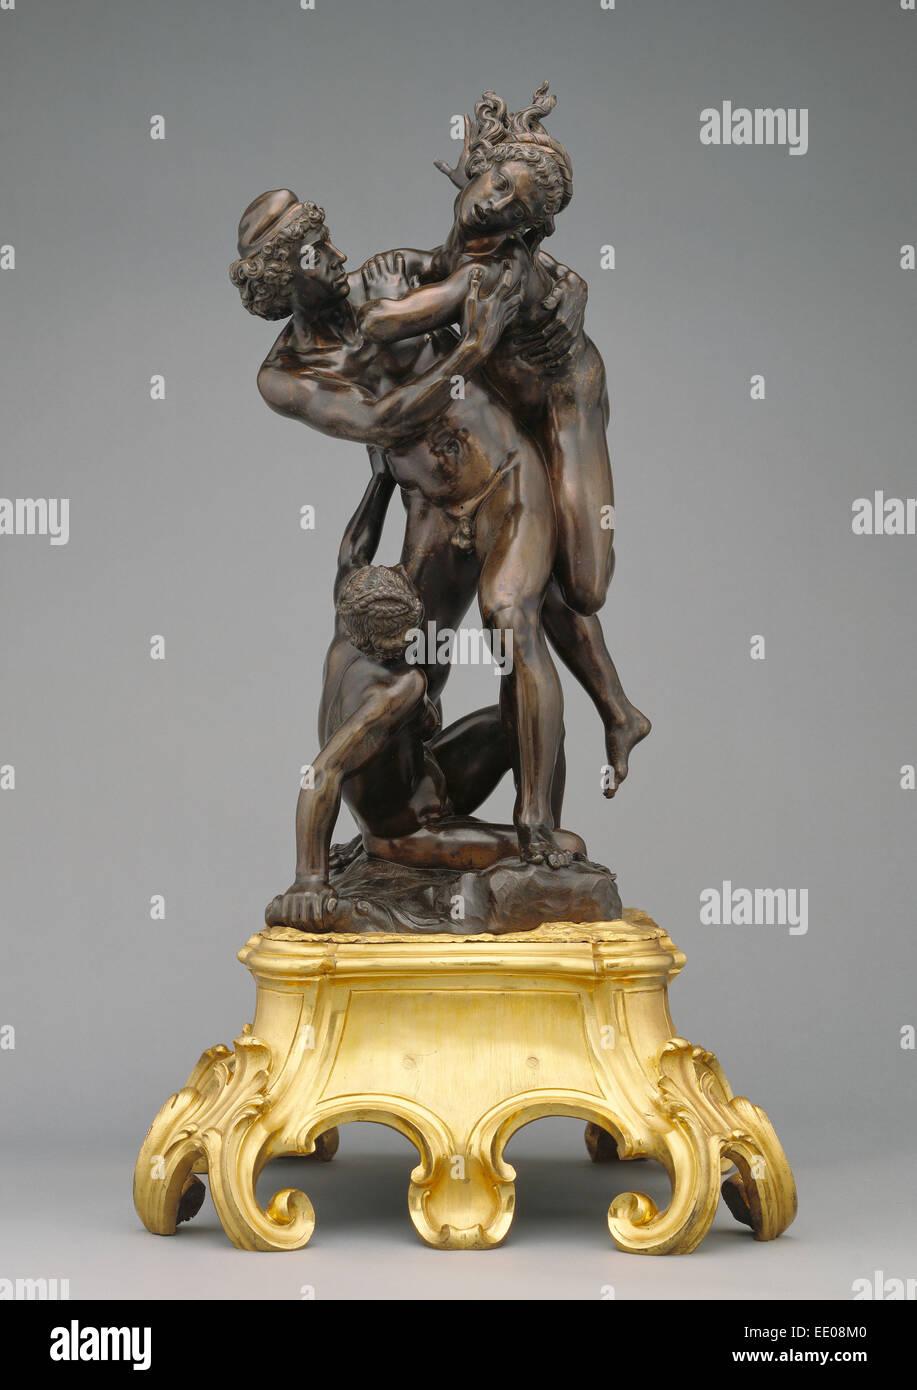 The Abduction of Helen by Paris; Giovanni Francesco Susini, Italian, 1585 - 1653; Italy, Europe; 1627; Bronze - Stock Image